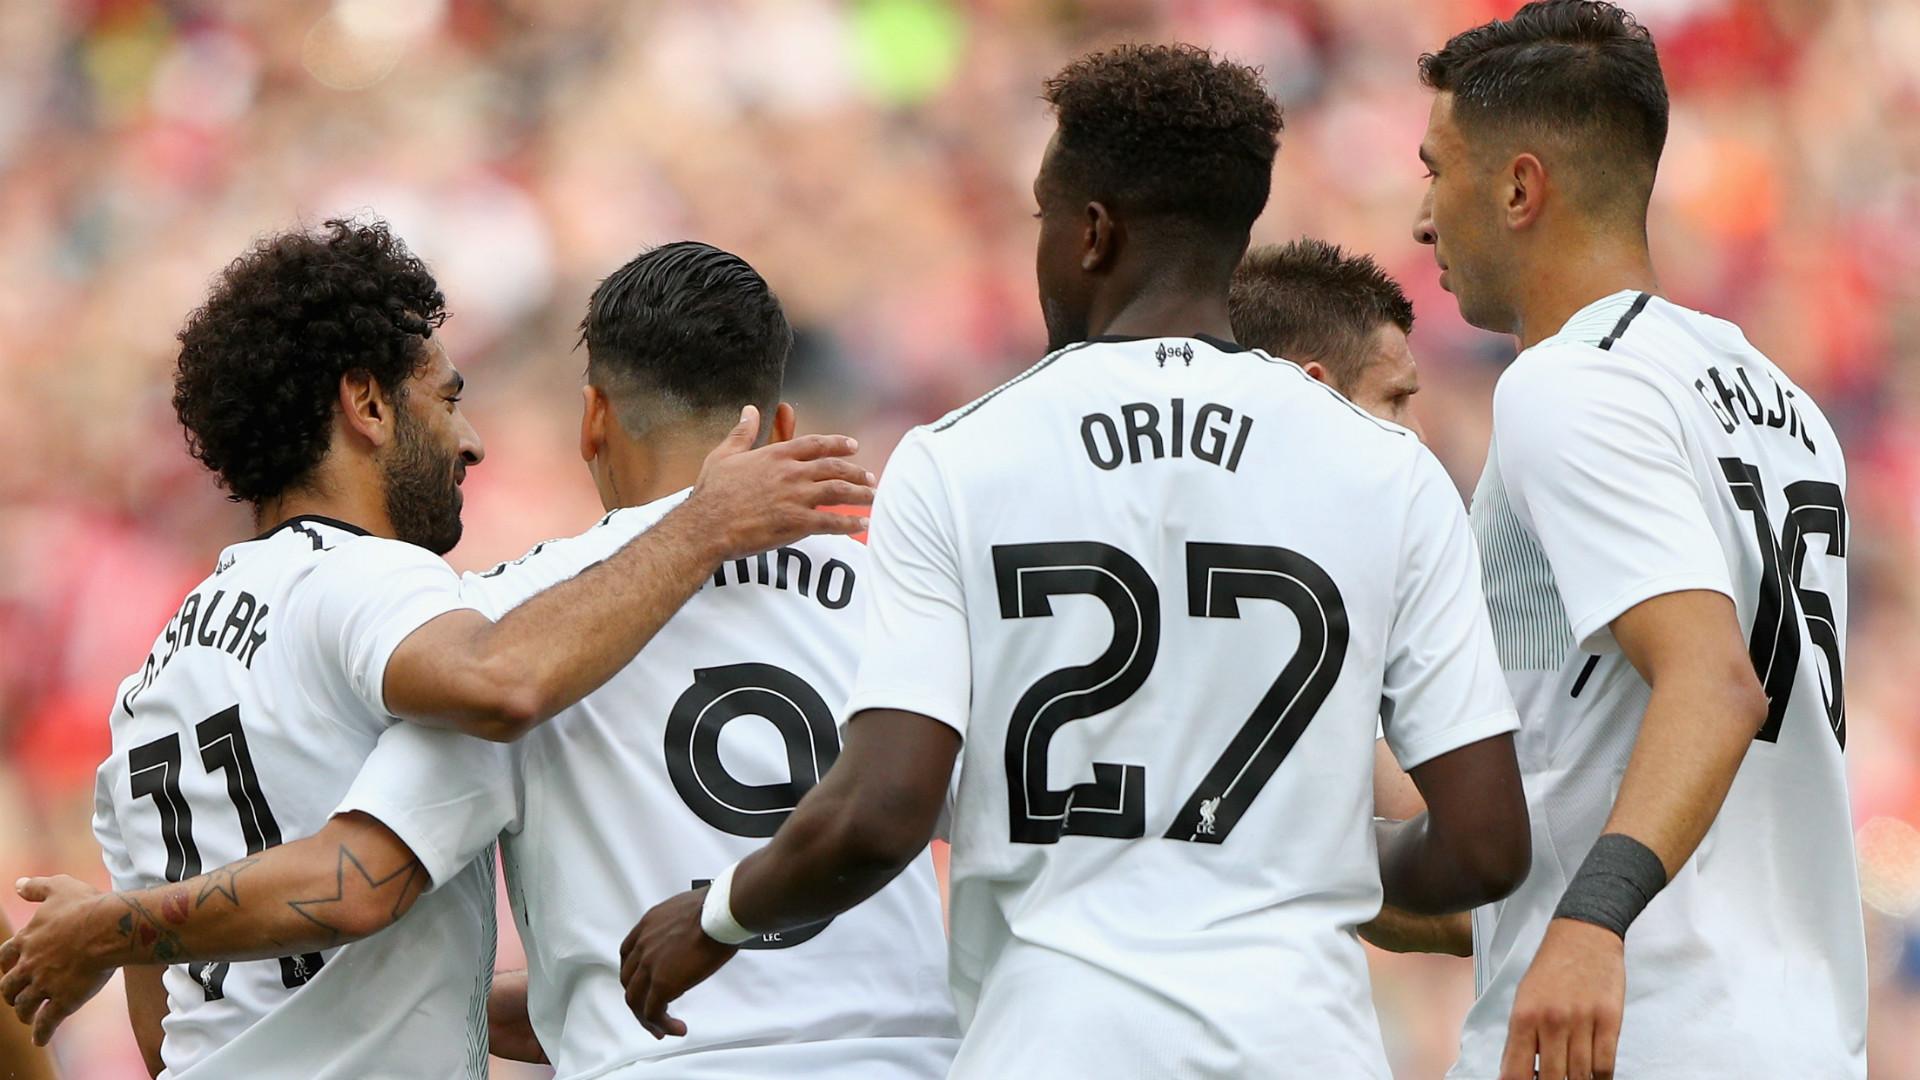 HD Salah Firmino Liverpool celebrate